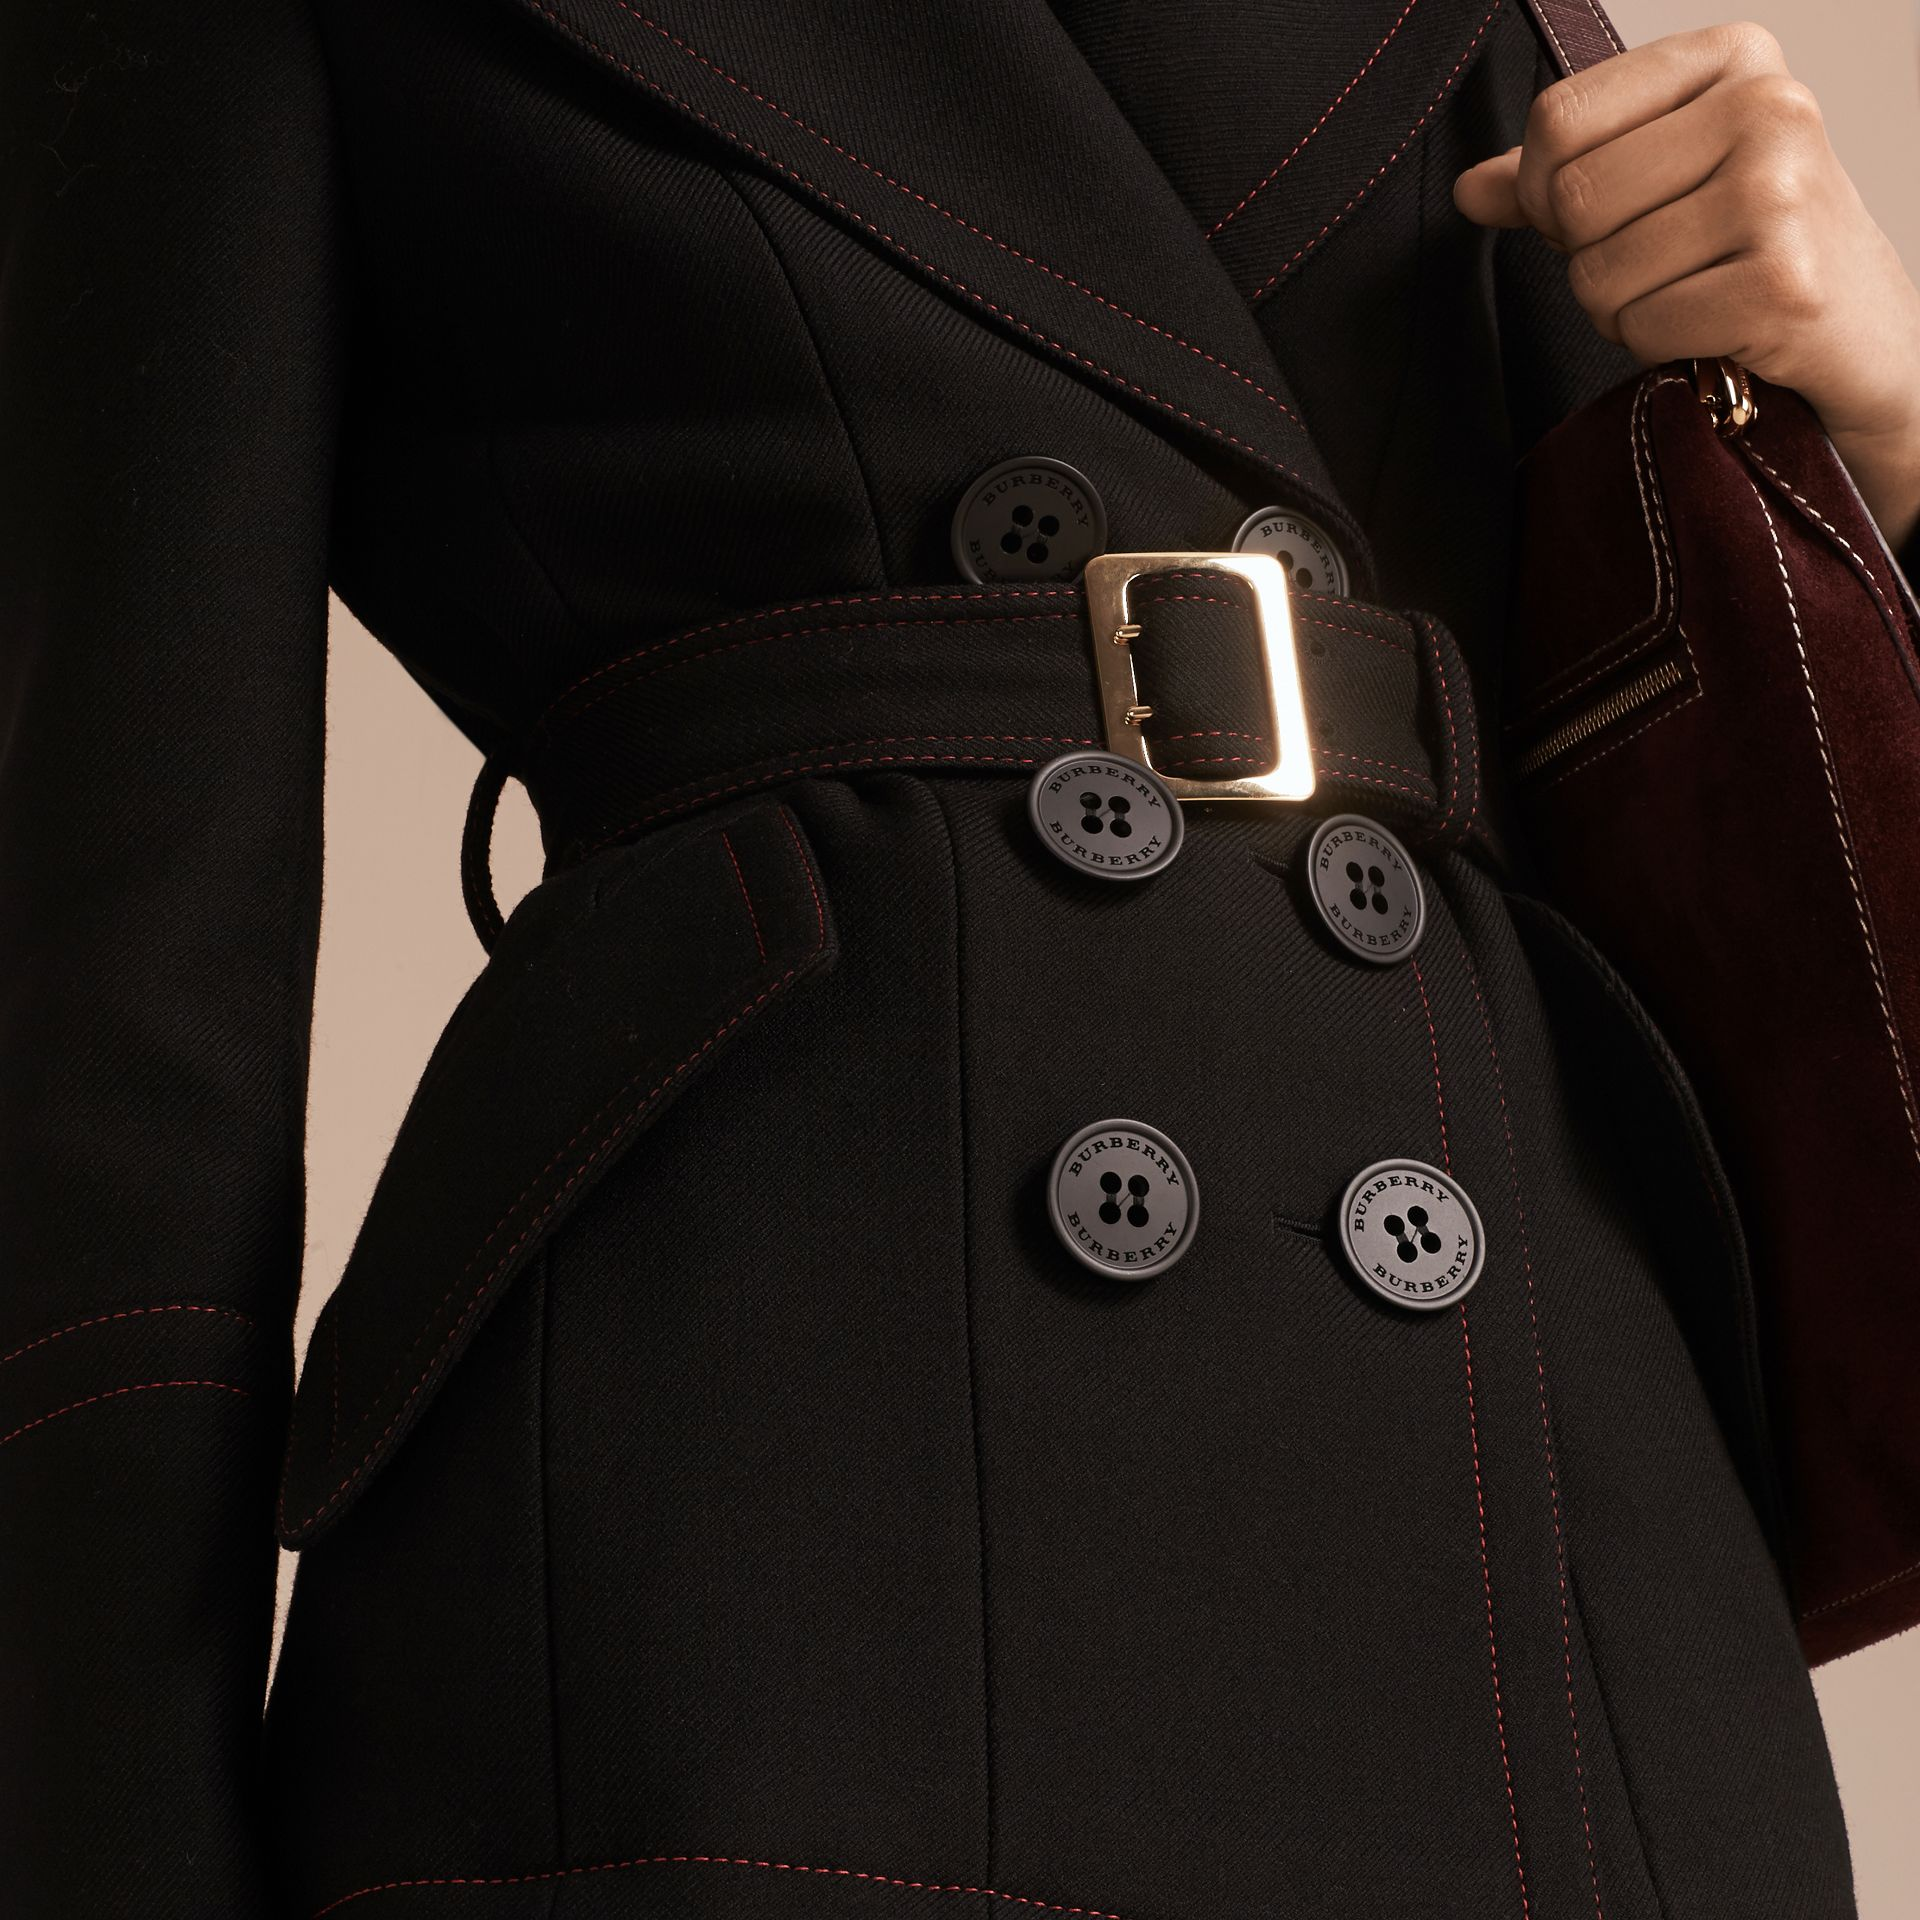 Black Wool Silk Pea Coat with Regimental Topstitching - gallery image 5